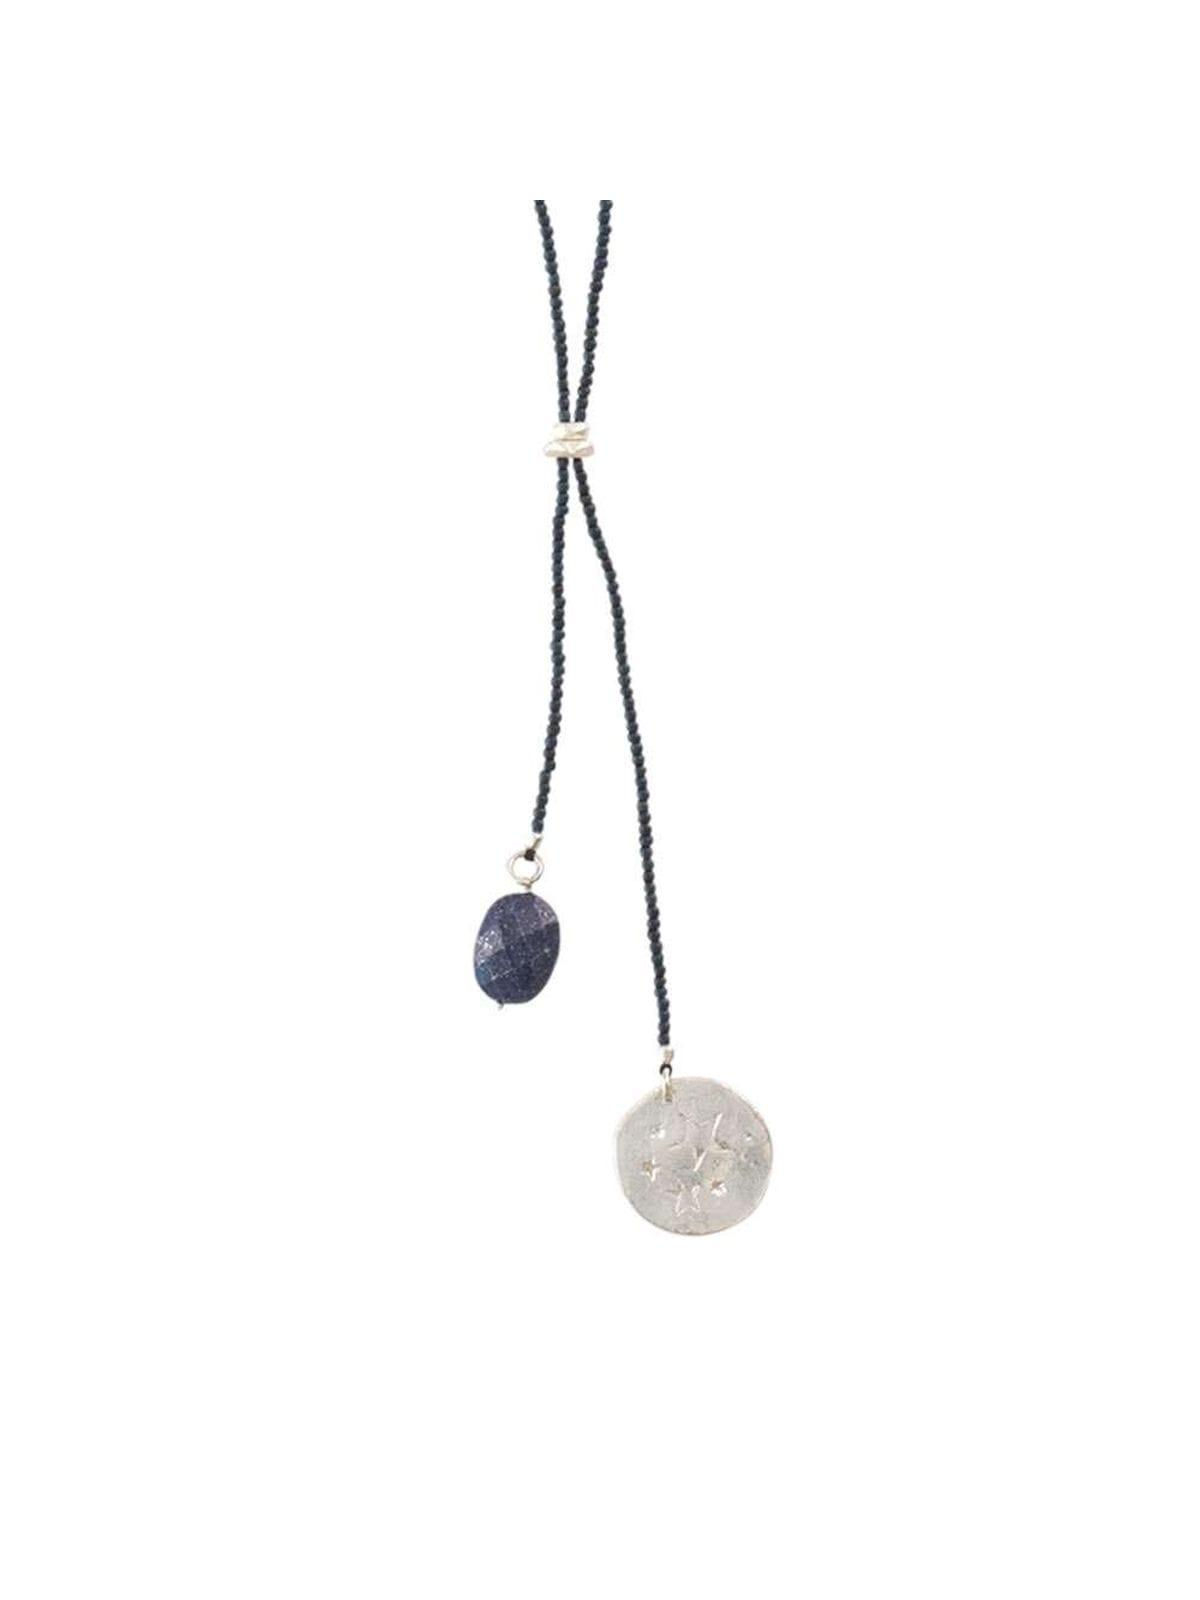 bl23558-fairy-lapis-lazuli-stars-coin-silver-necklace_1_600x600@2x_1200x1600